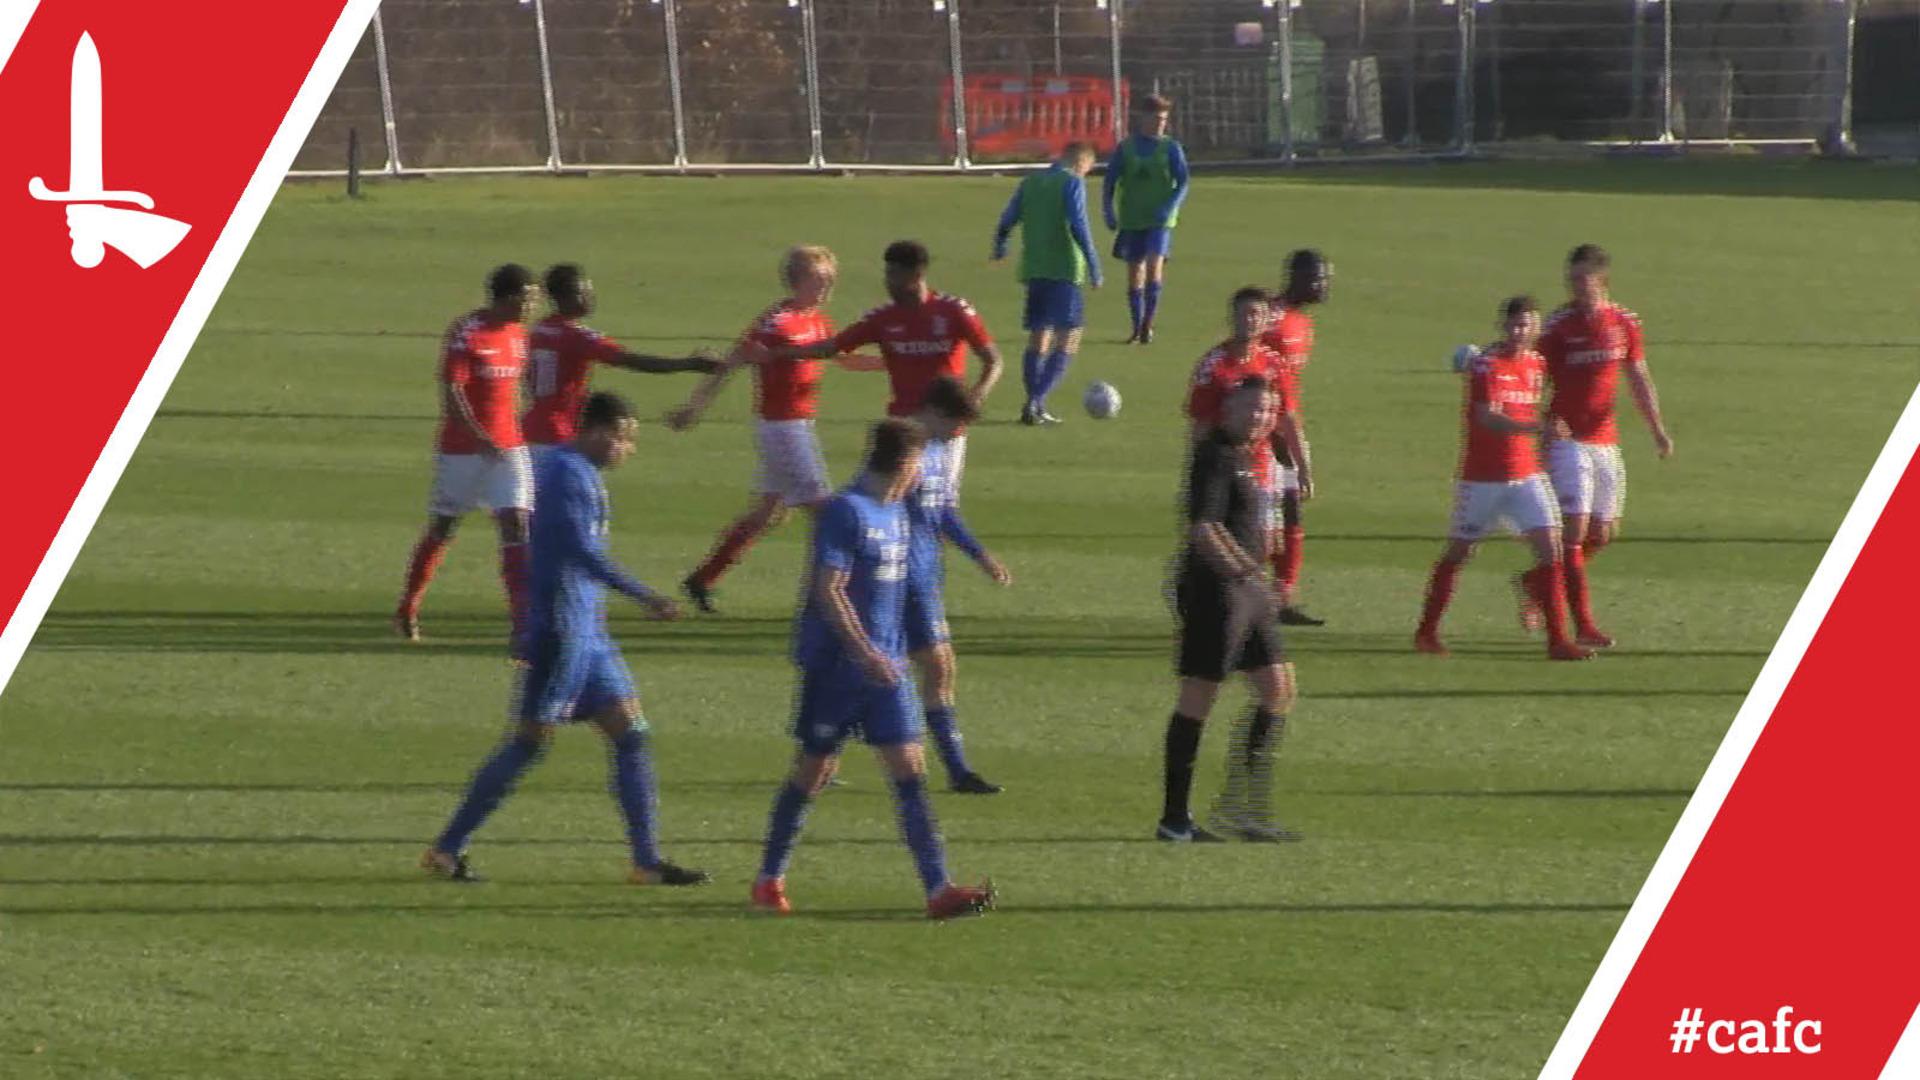 U23S HIGHLIGHTS | Charlton 3 Cardiff 3